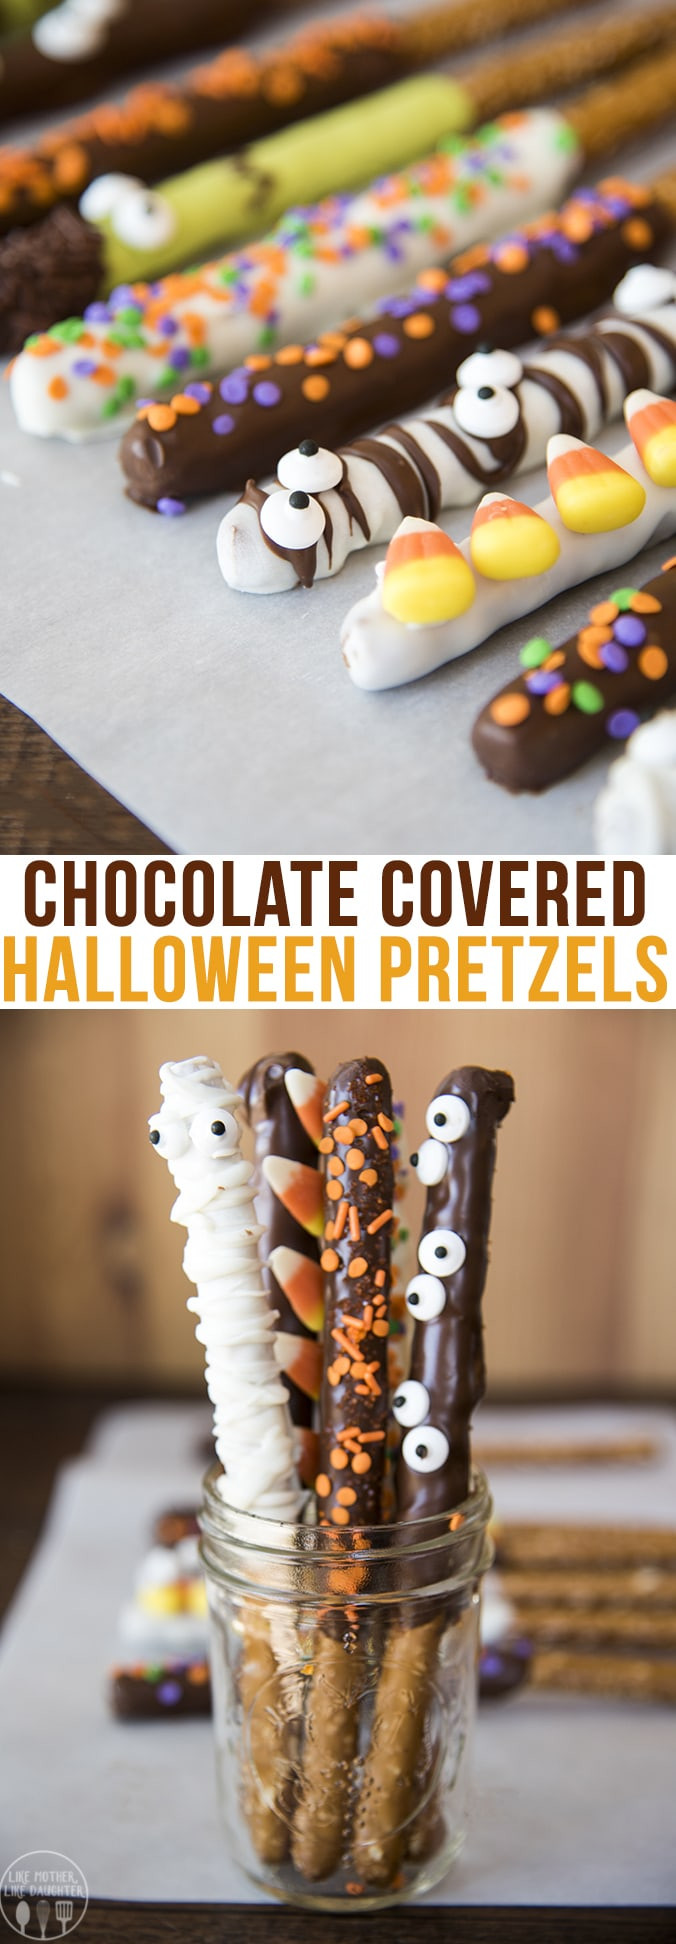 Chocolate Covered Pretzels Halloween  Chocolate Covered Halloween Pretzels – Like Mother Like